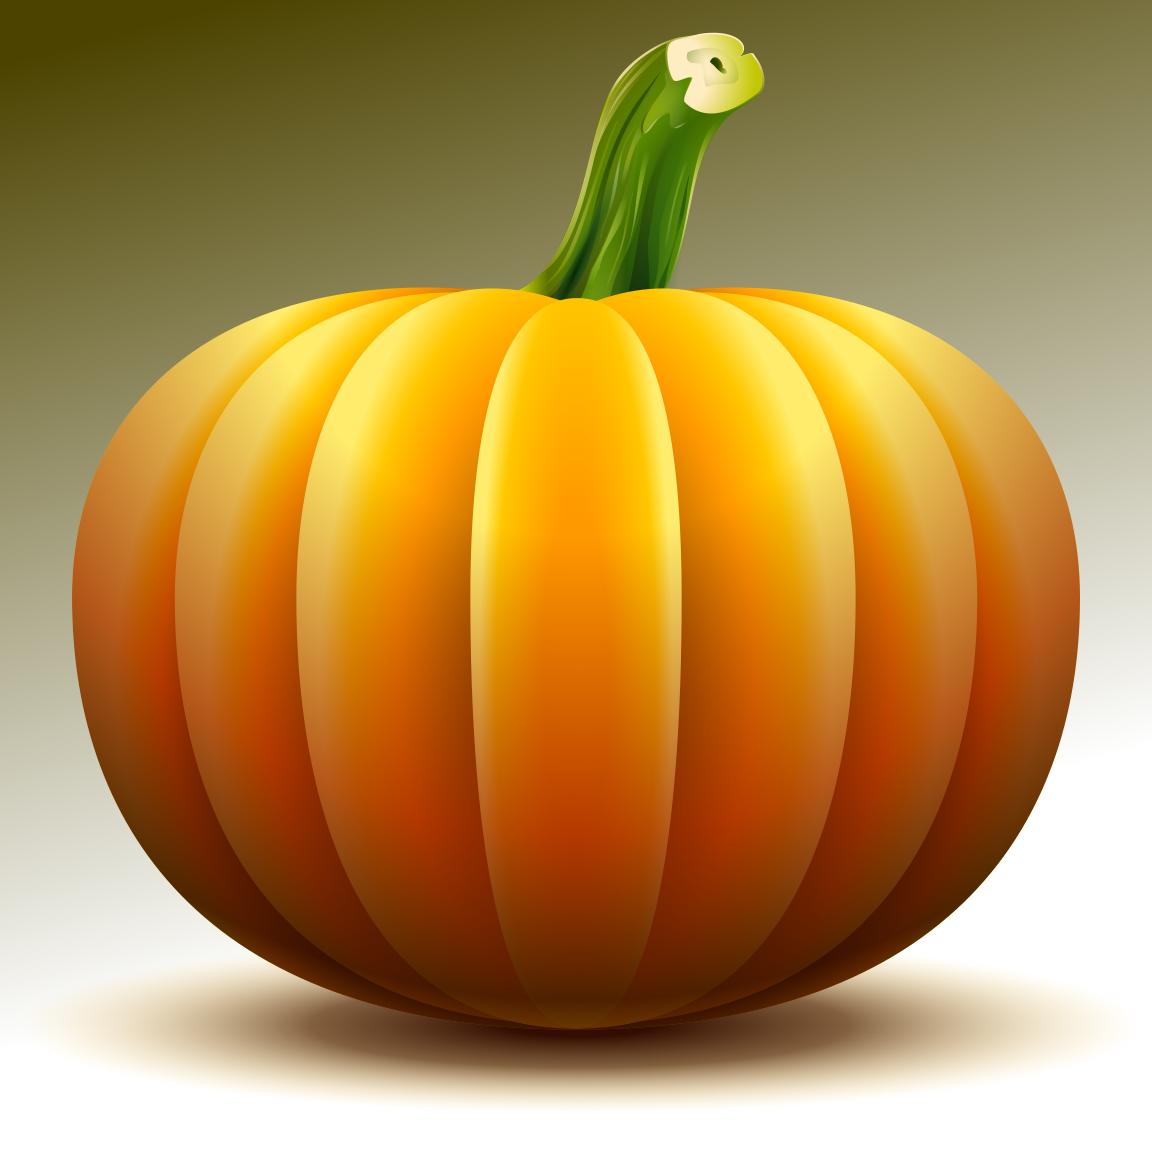 Drawn pumpkin gourd DigitalDrawer: Draw a Pumpkin